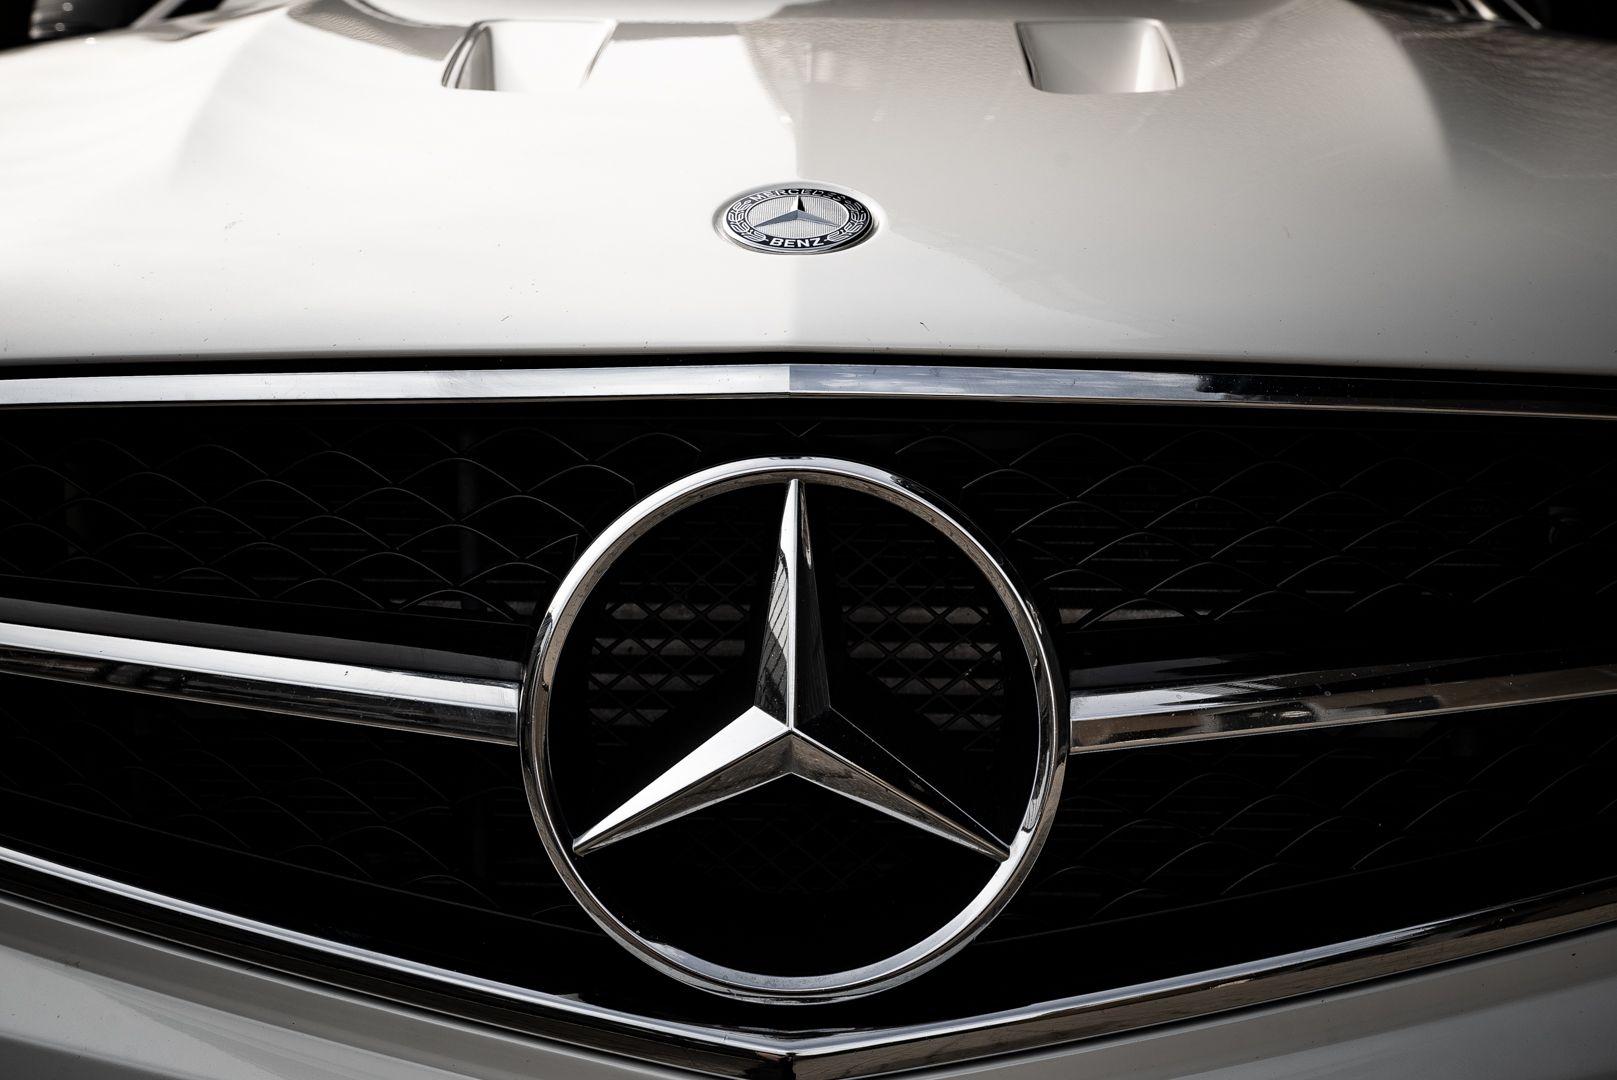 2012 Mercedes-Benz C63 AMG Black Series 71767